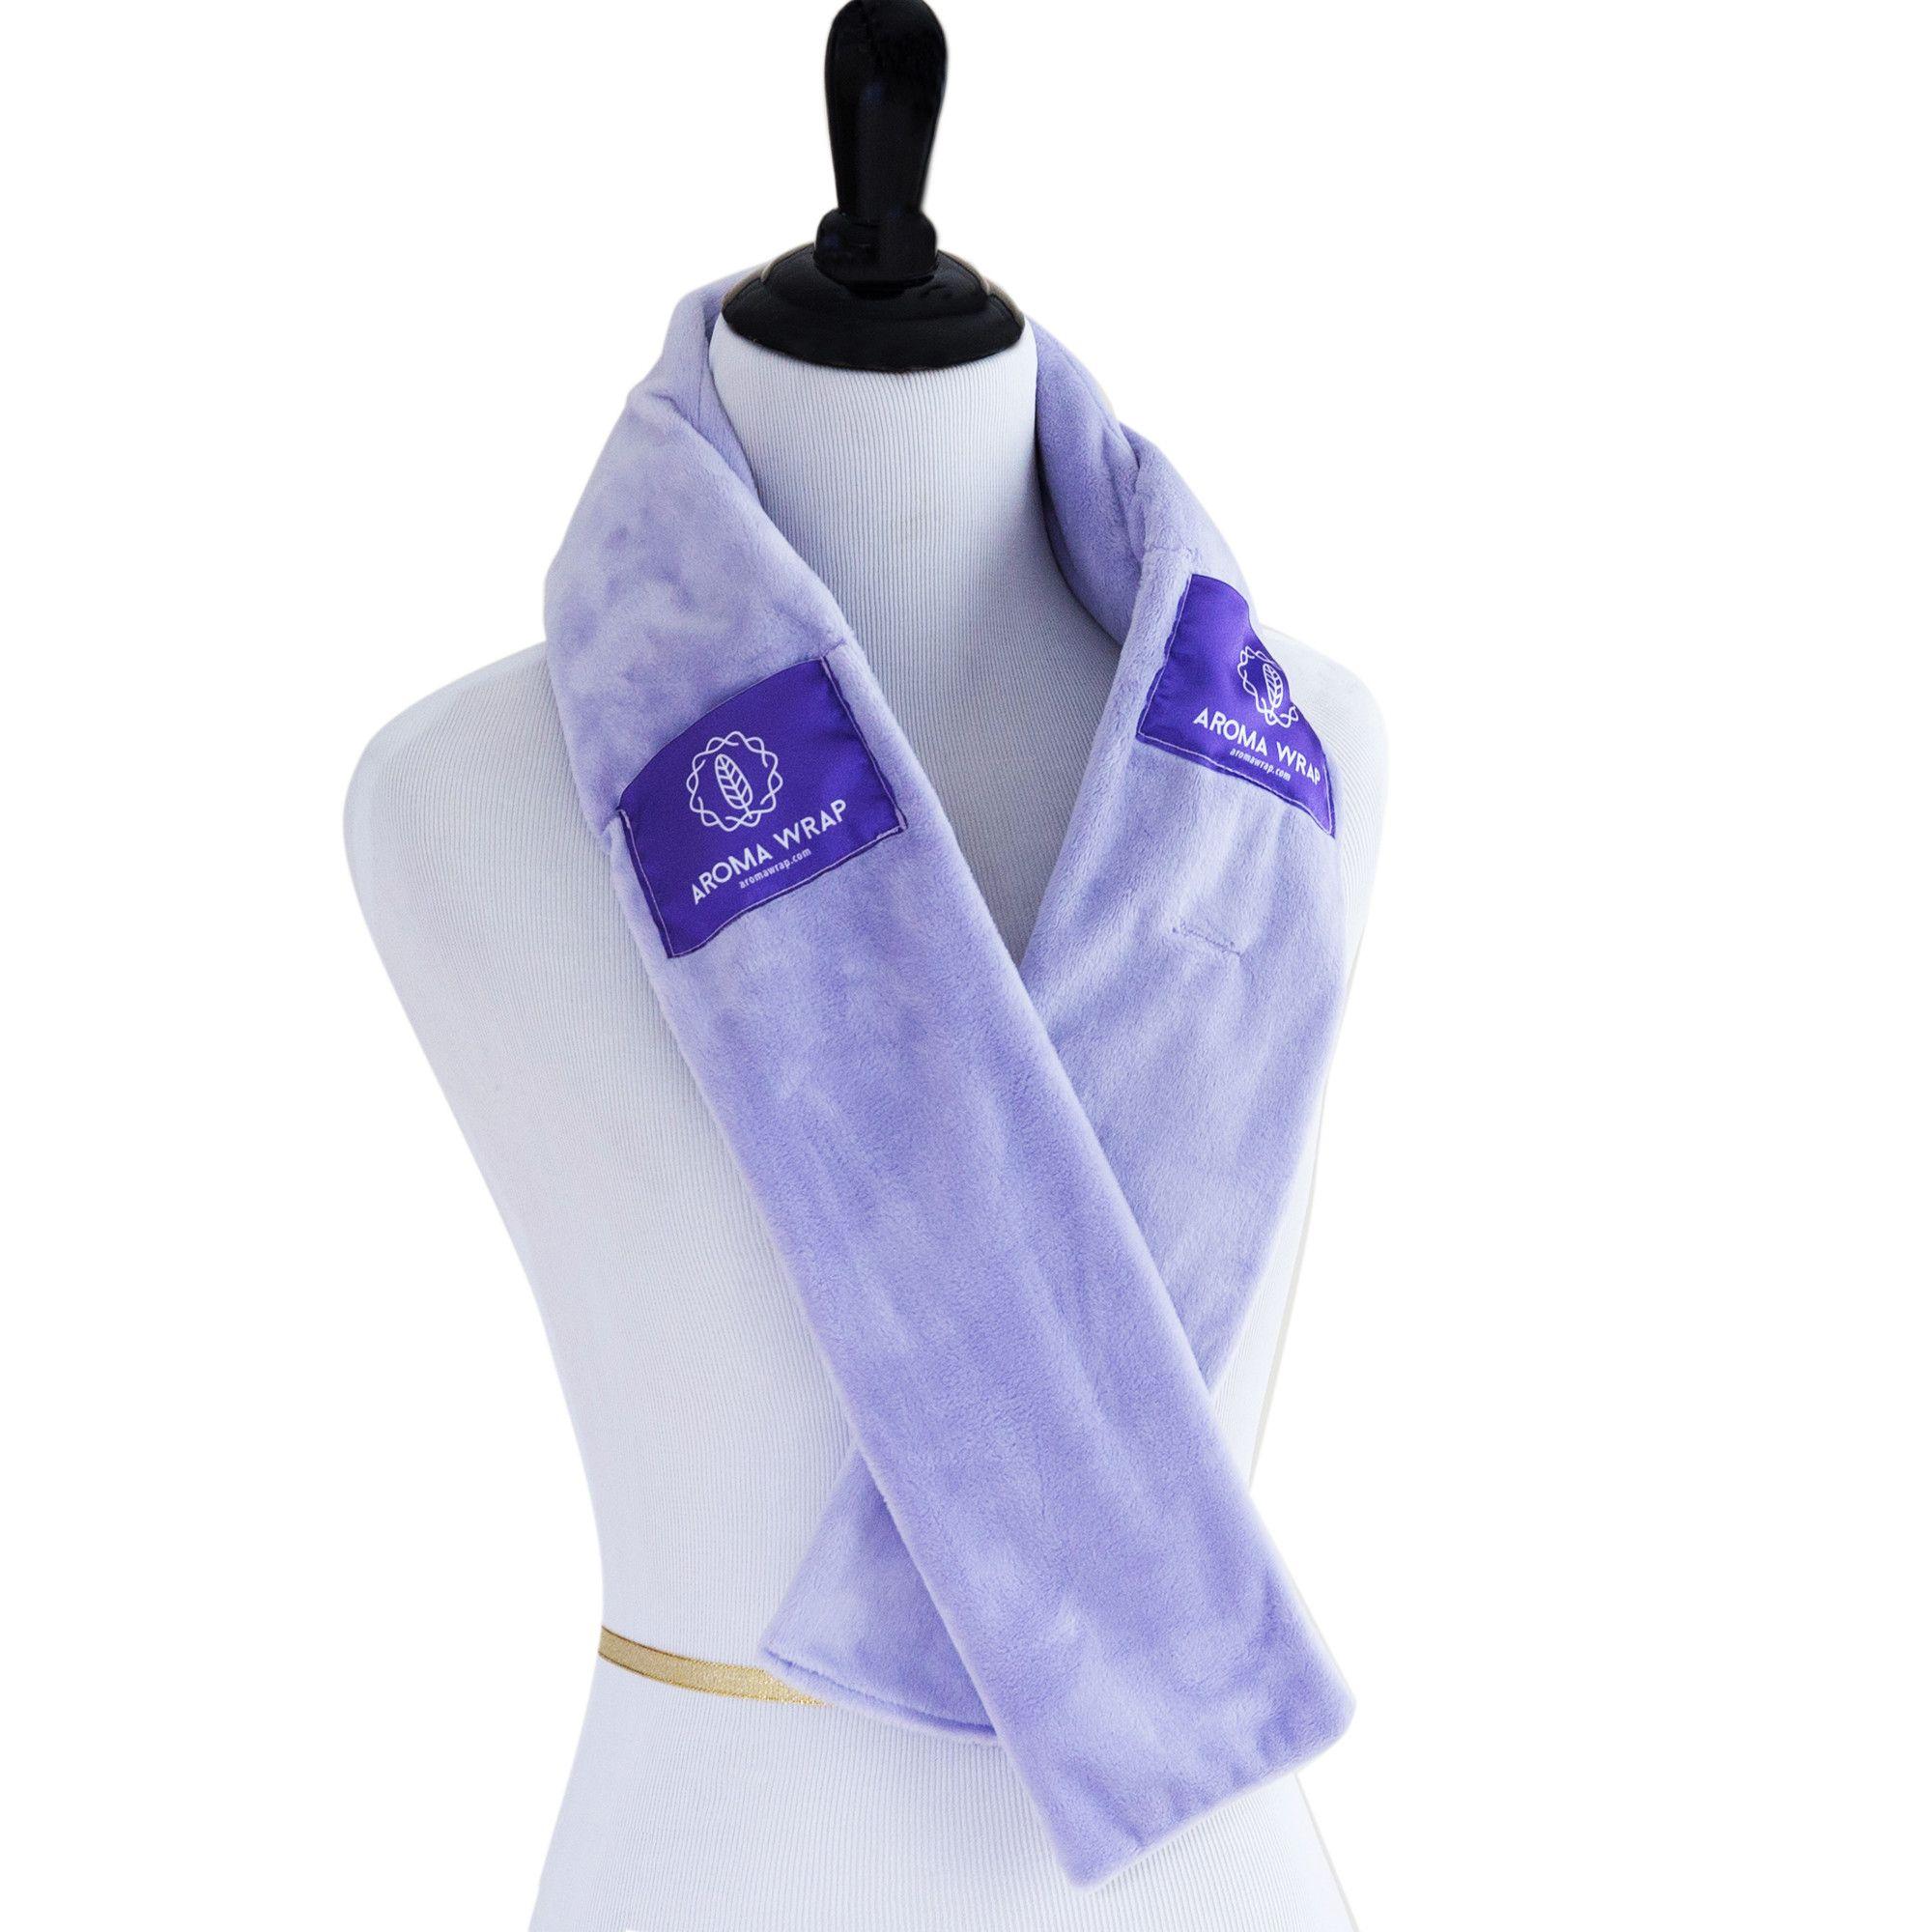 Signature Series 4 Piece Therapeutic Aromatherapy Neck Wrap Set